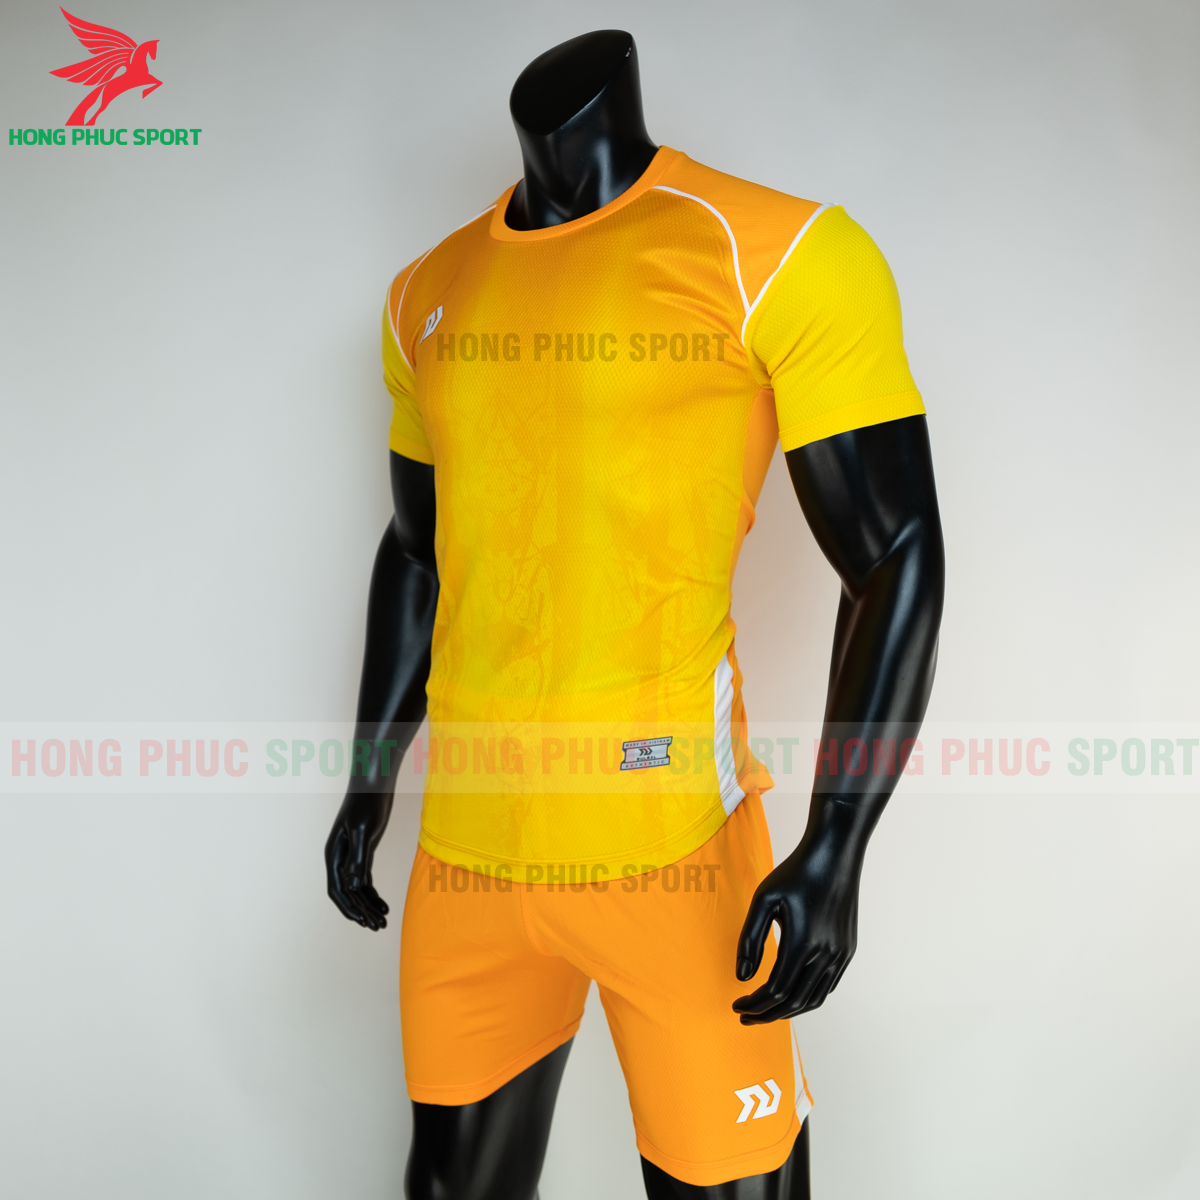 https://cdn.hongphucsport.com/unsafe/s4.shopbay.vn/files/285/ao-bong-da-khong-logo-bulbal-hades-mau-vang-4-604f31eb56220.png